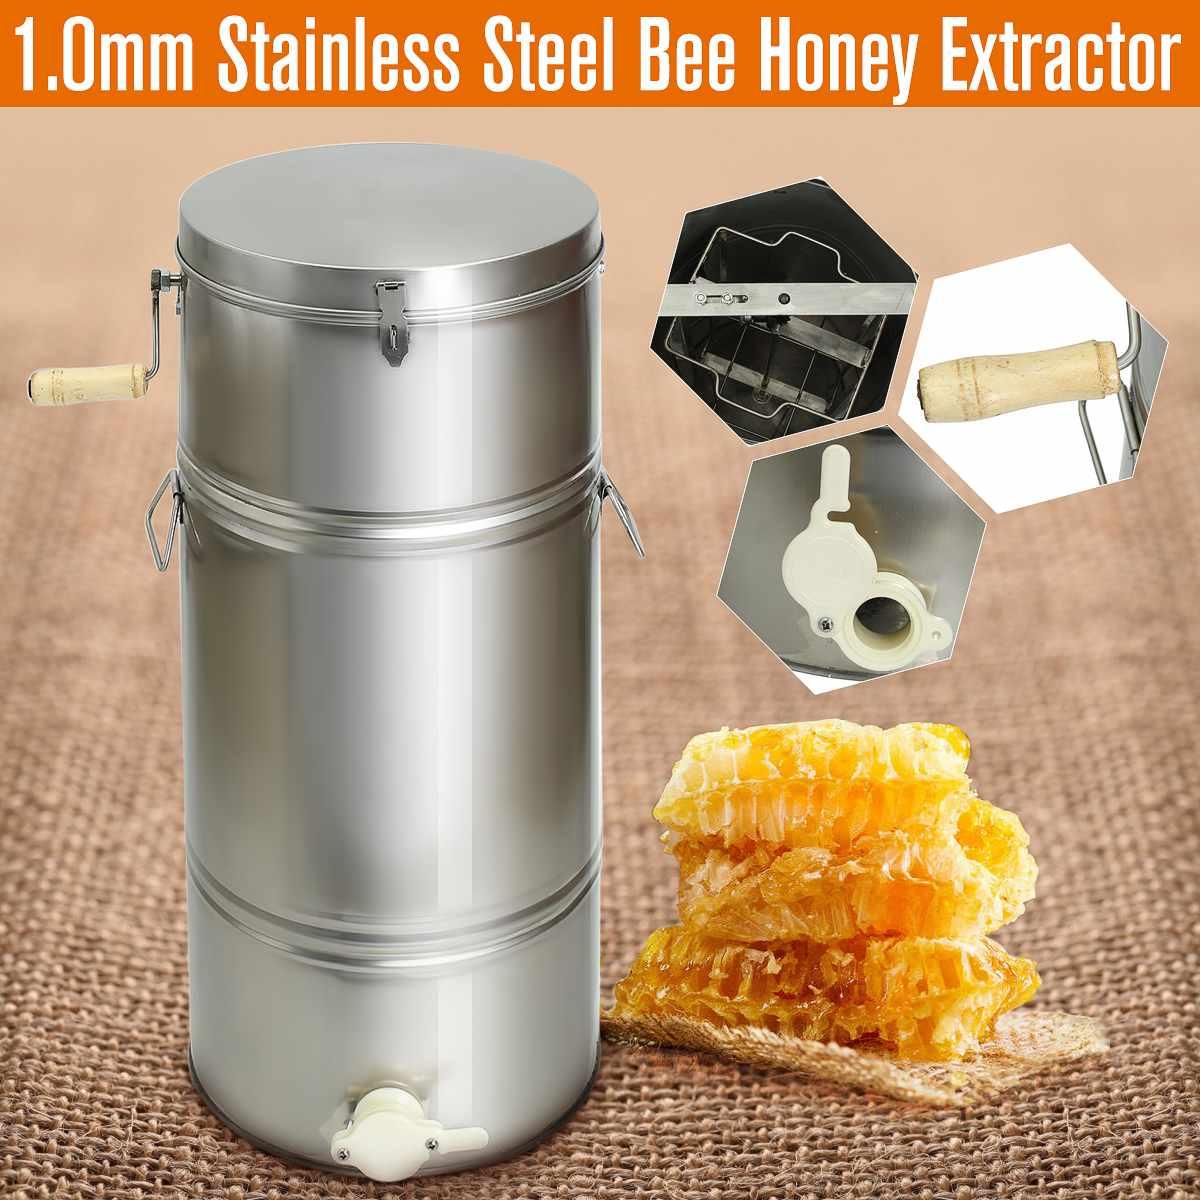 2 Frame Honey Extractor Stainless Steel Beekeeping Machine Tool Box Honey Extractor Supplies Beekeeping Equipment